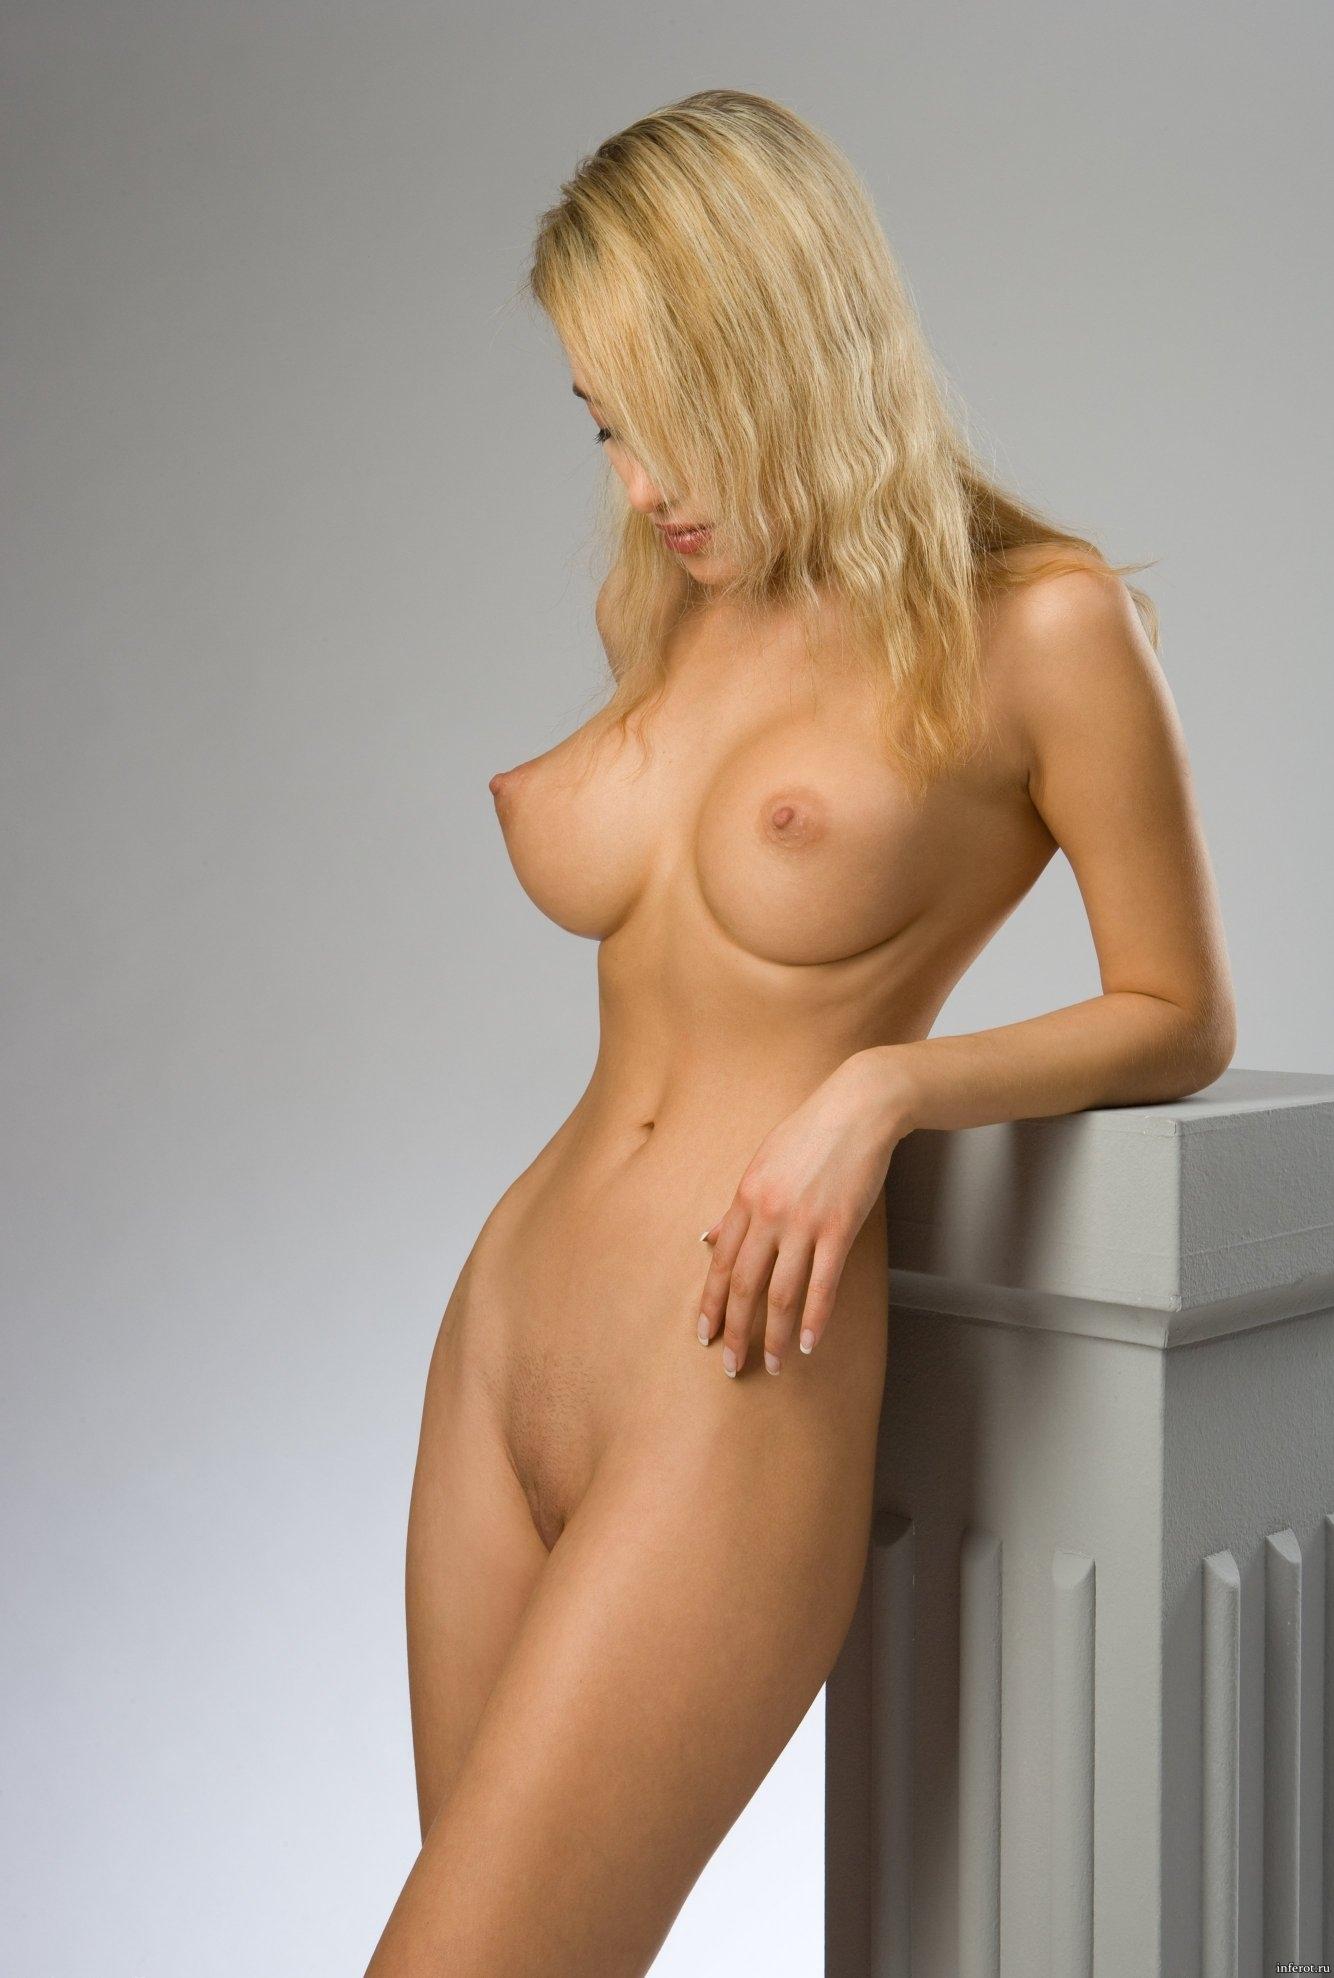 golie-siski-torchkom